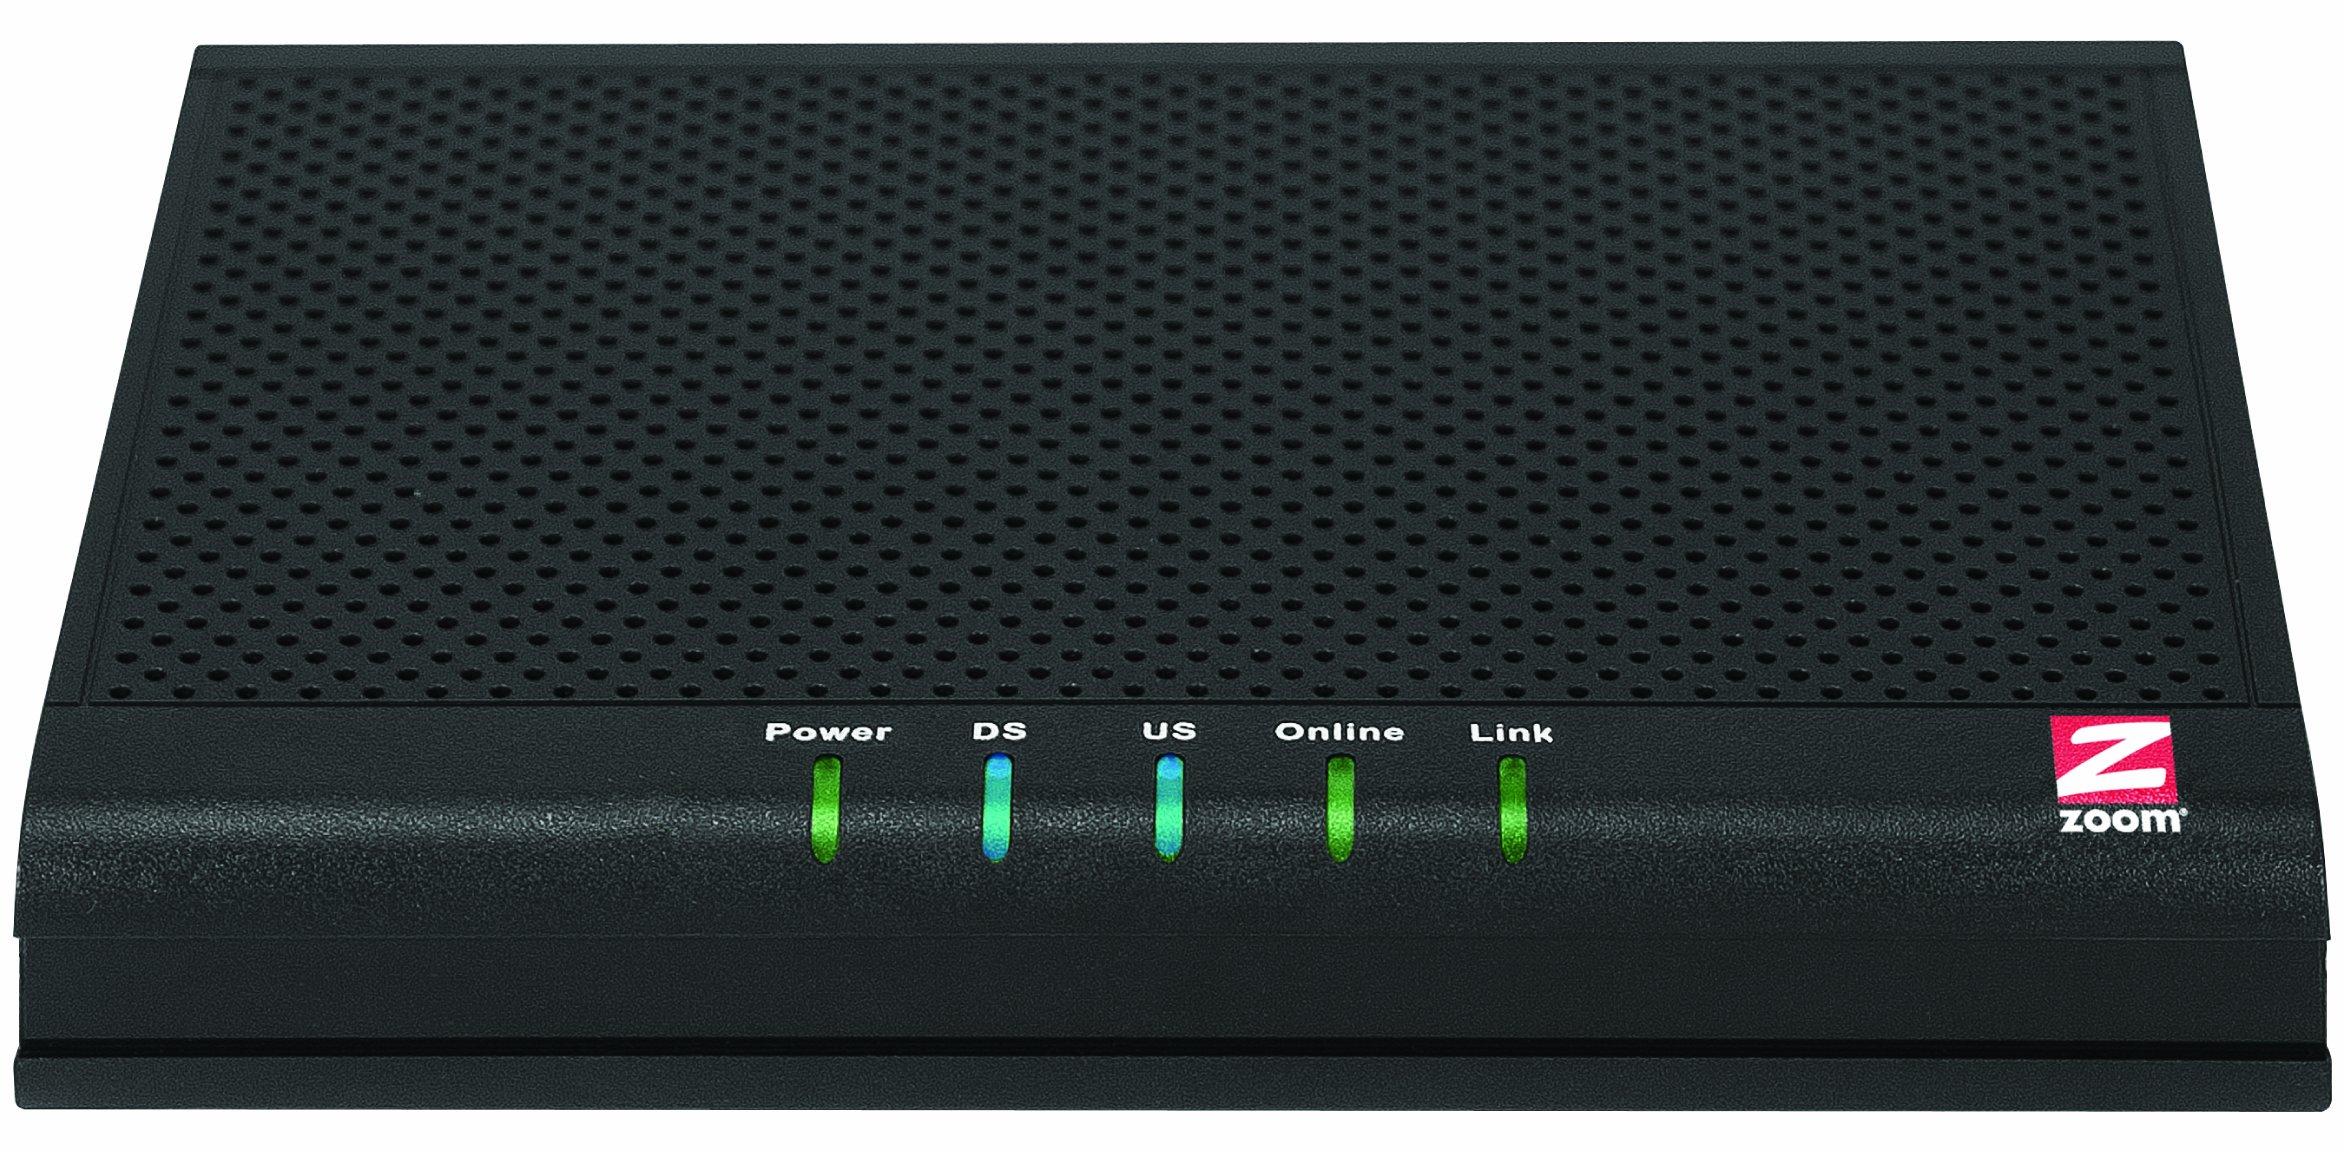 ZOOM TELEPHONICS DOCSIS 3.0 5341-00-00J 343Mbps Cable Modem